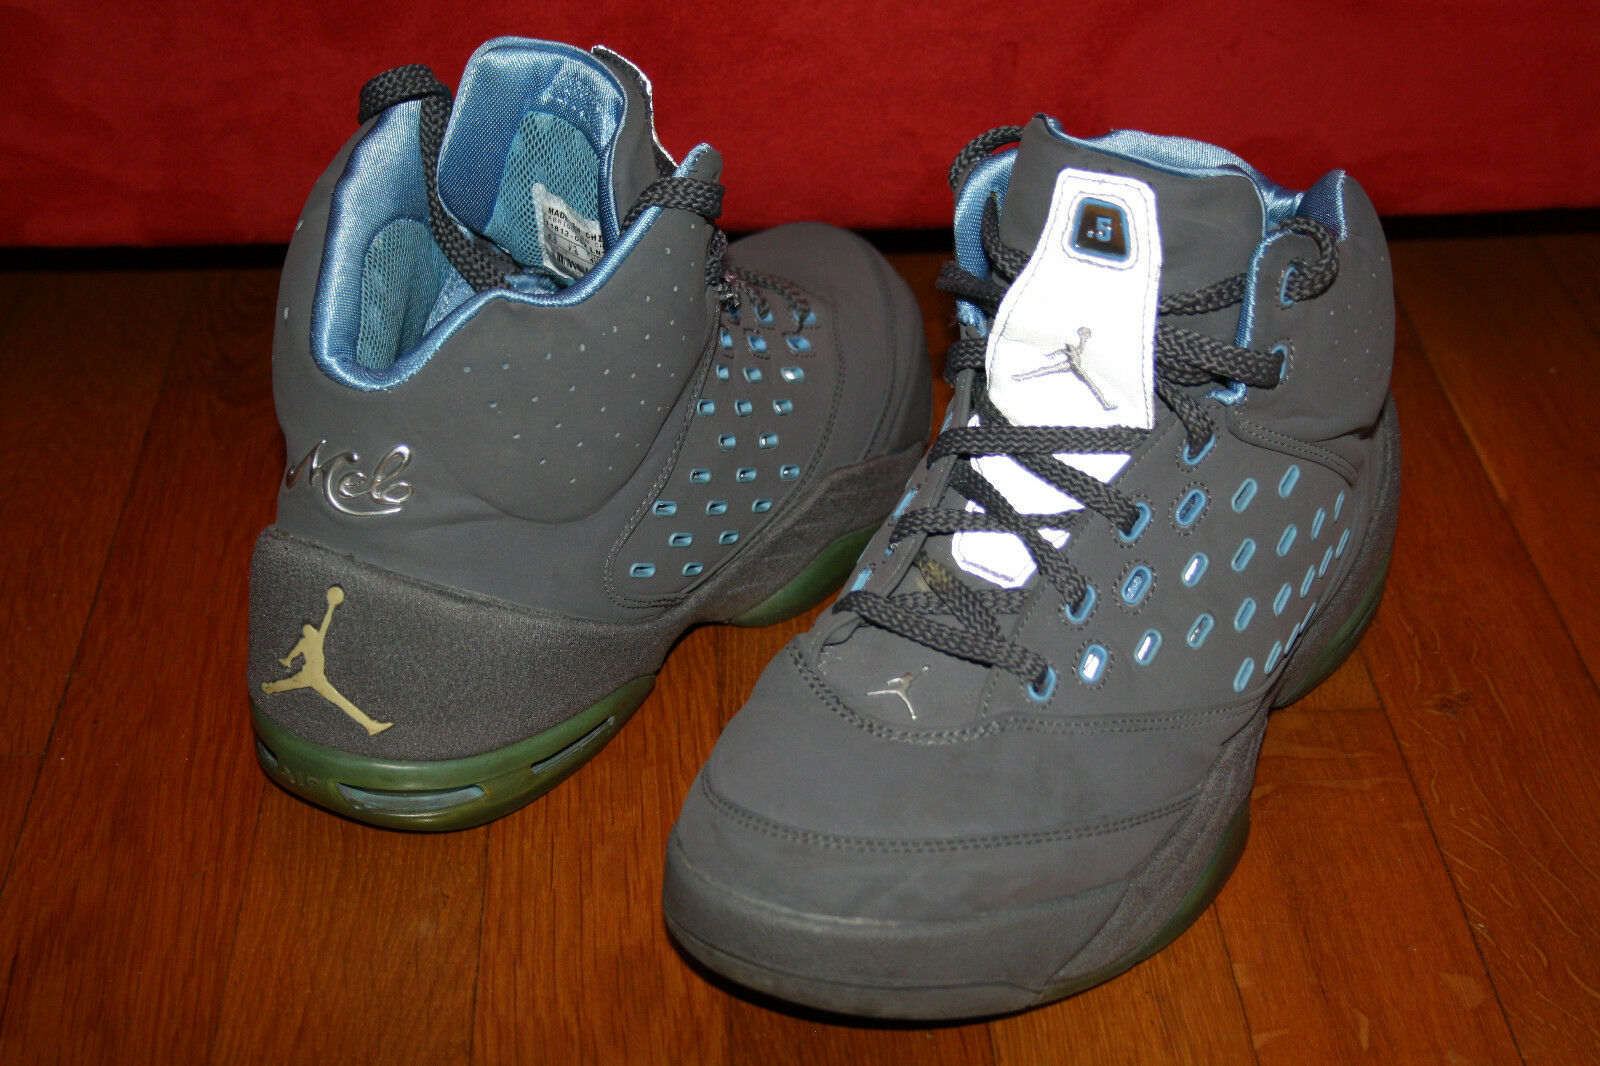 Air Jordan Melo 5.5 Denver Nuggets Gr. 42 US 8,5